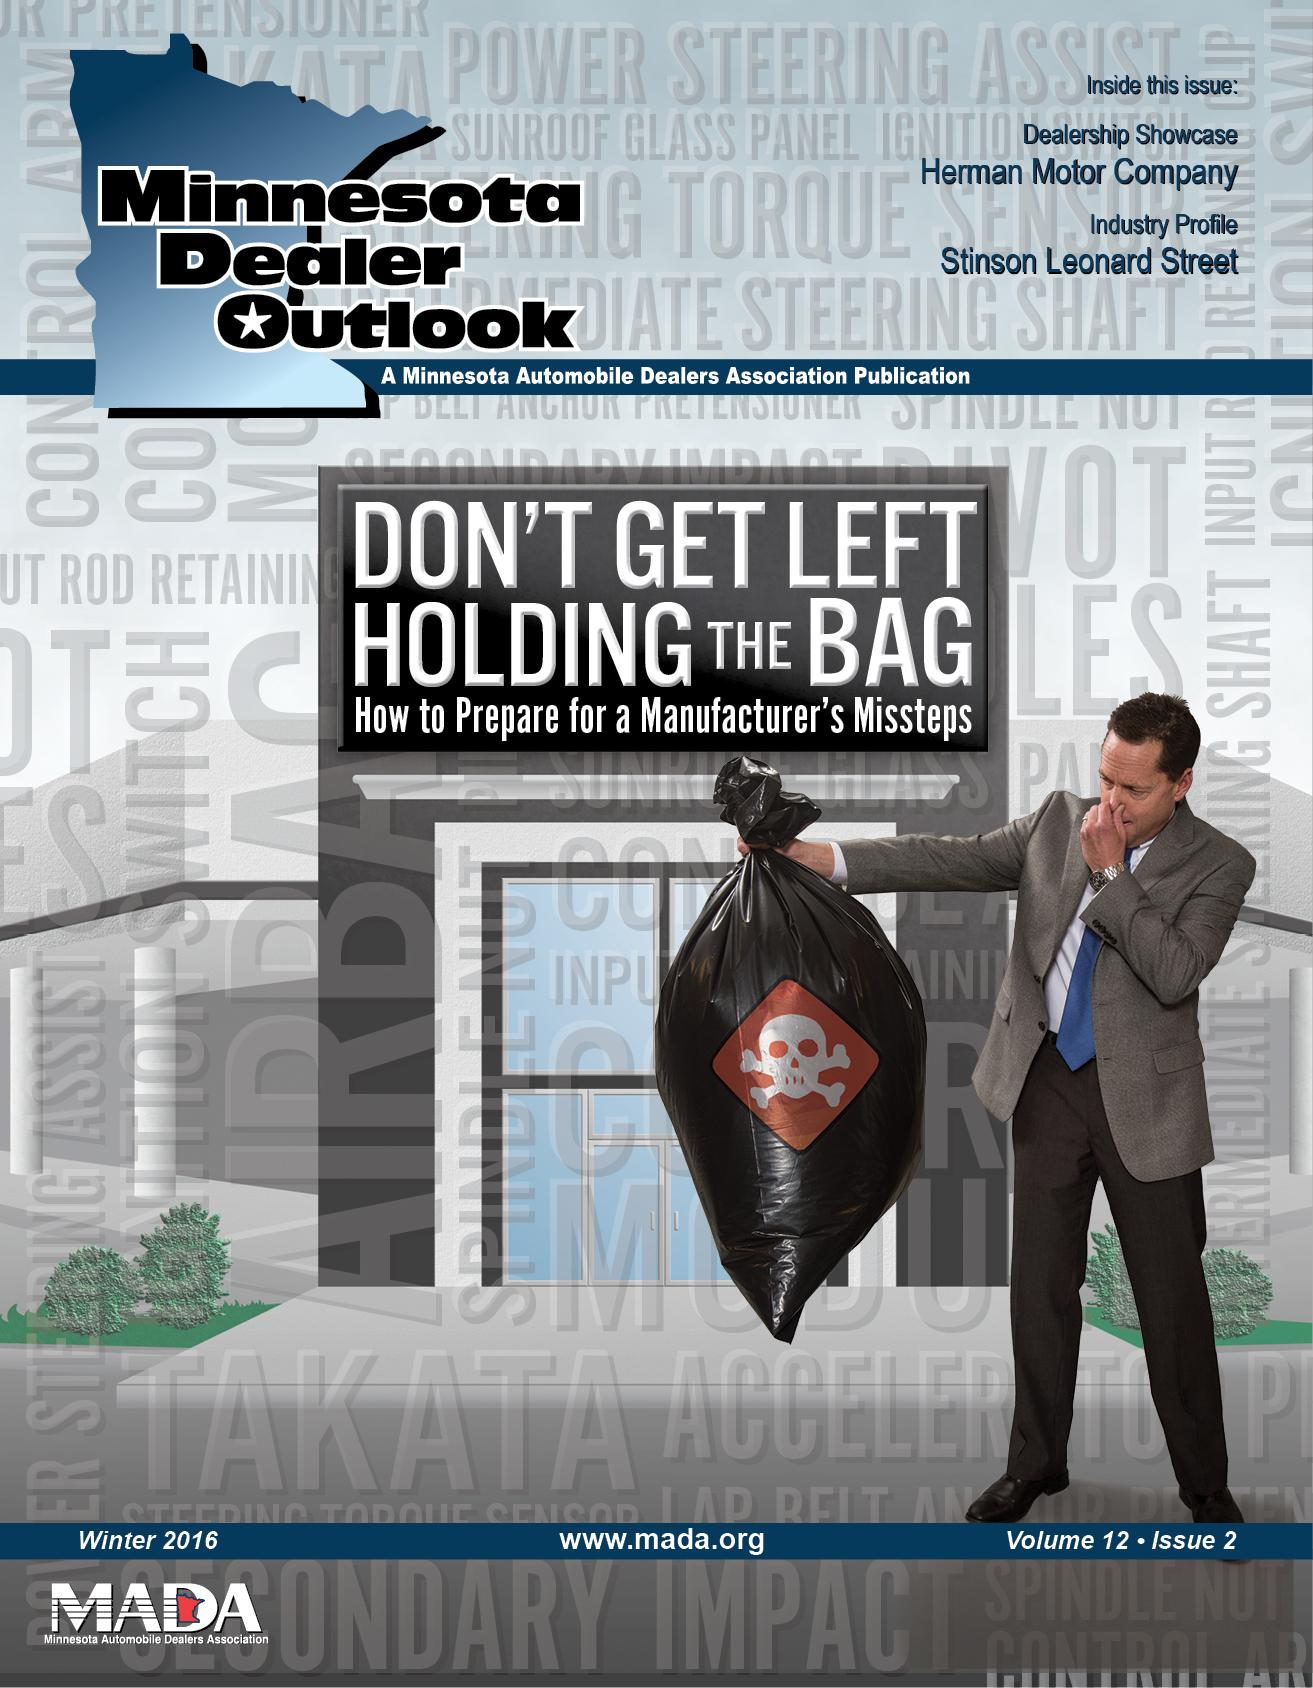 Twin Cities Ford Dealers >> Minnesota Automobile Dealers Association - MADA :: MN Dealer Outlook Magazine